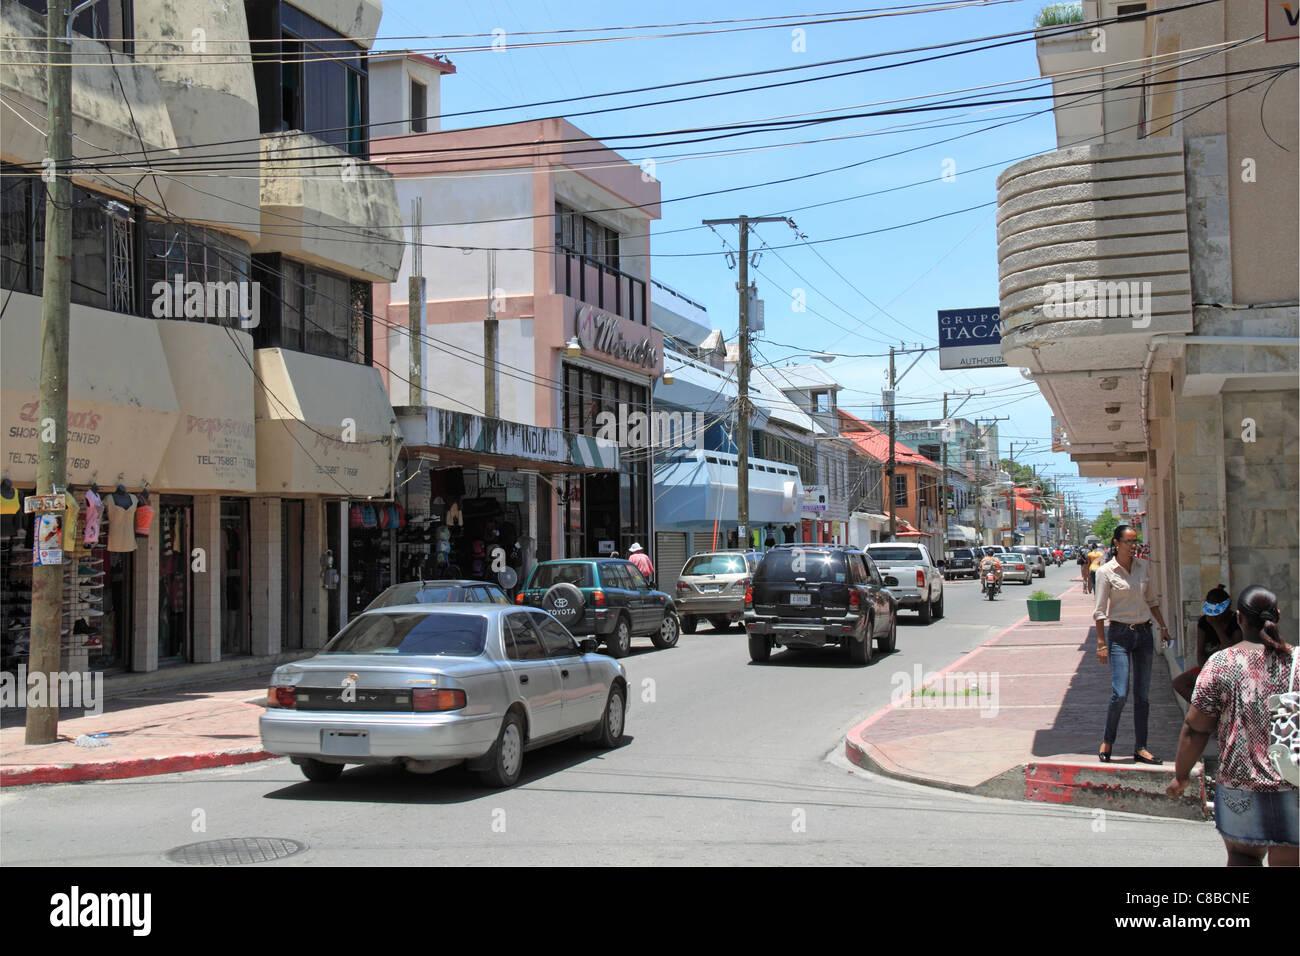 Albert Street, main shopping street of Belize City, Belize, Caribbean, Central America - Stock Image